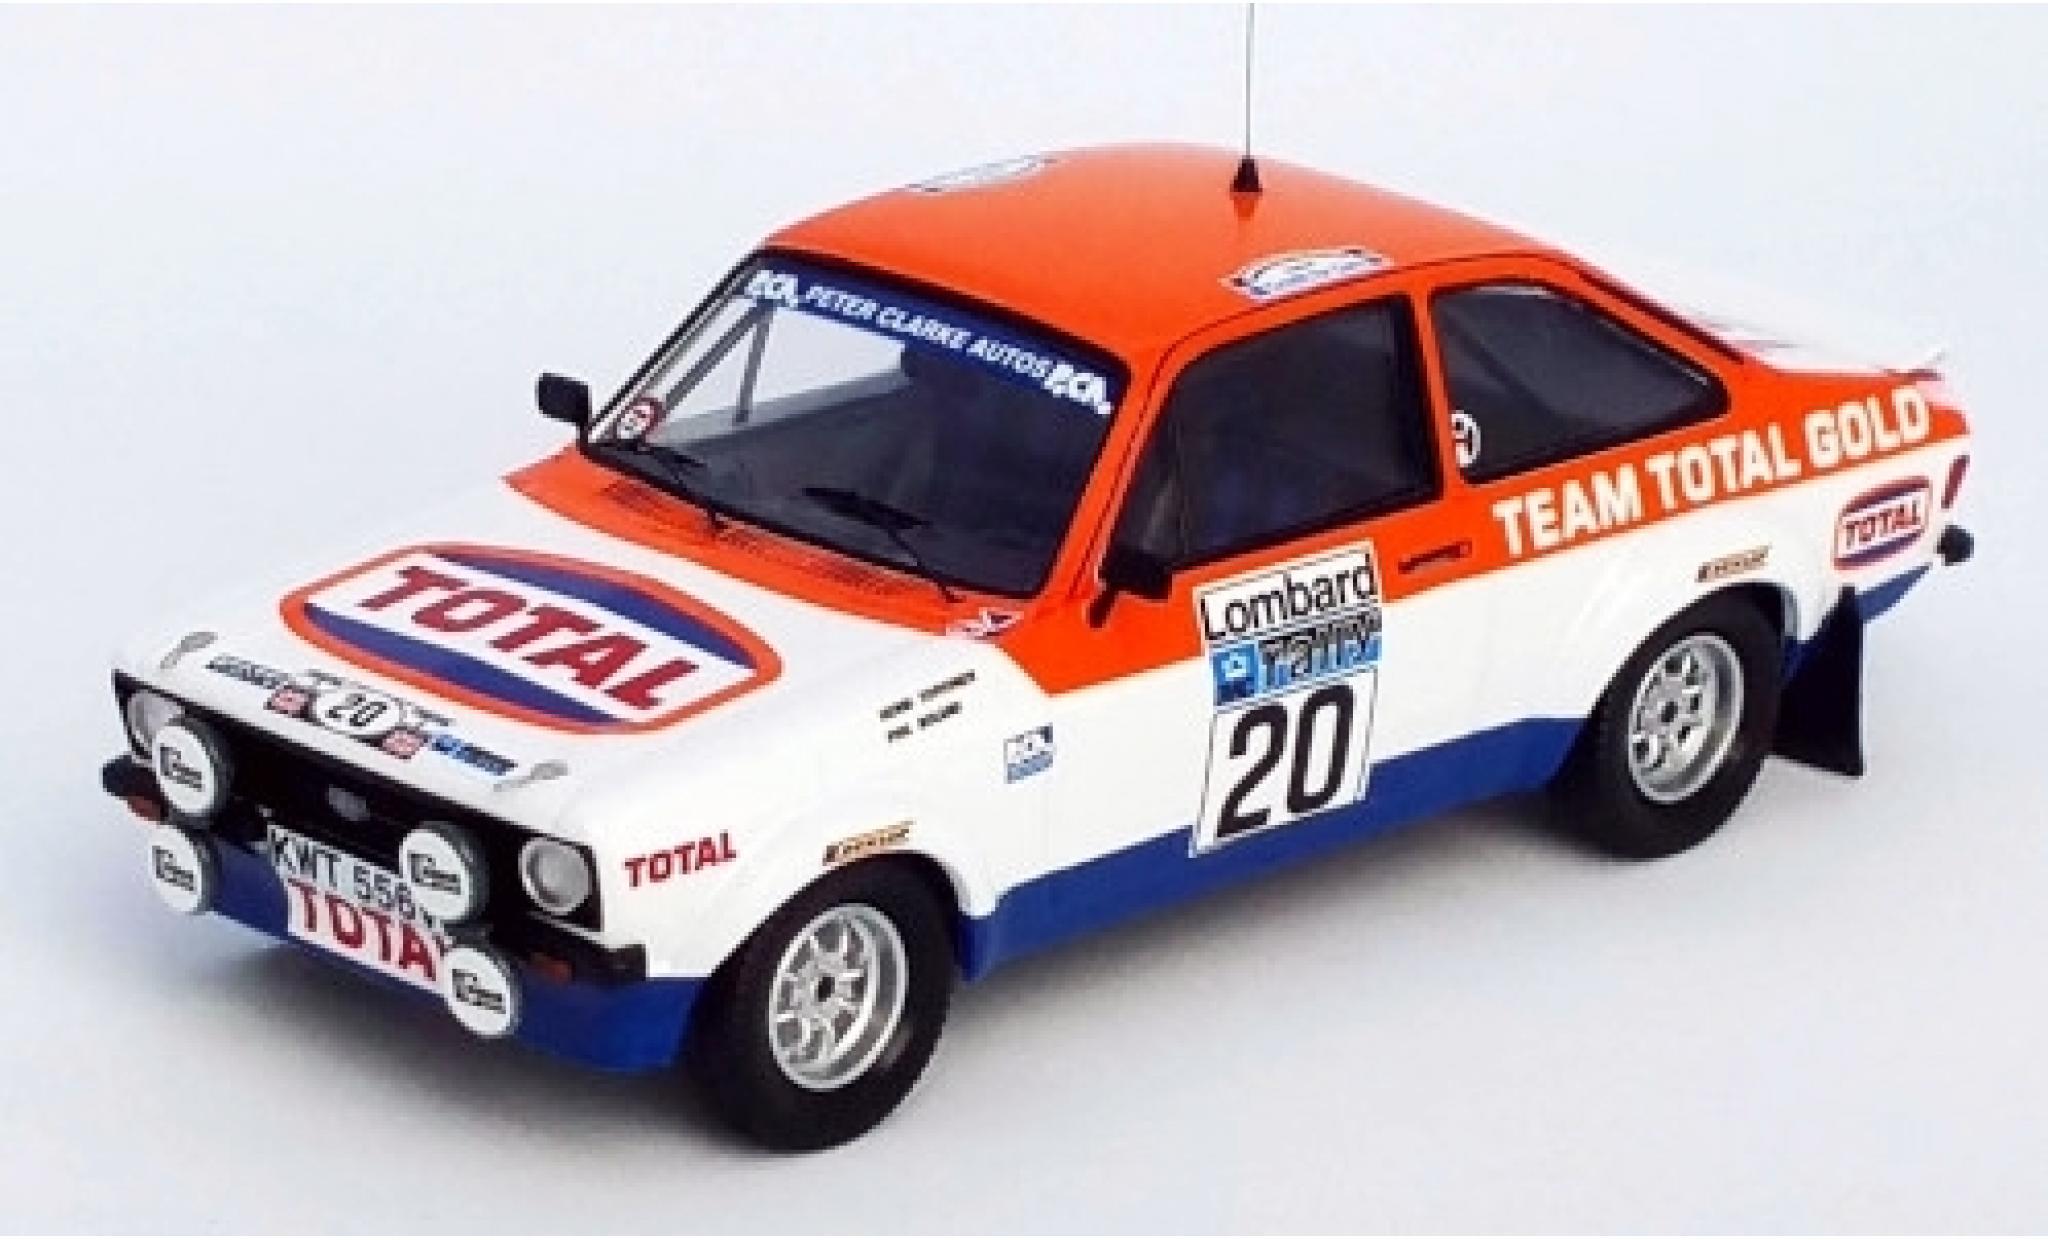 Ford Escort 1/43 Trofeu MK II RS No.20 Team Total Gold Total Rallye WM RAC Rallye 1979 H.Toivonen/P.Boland